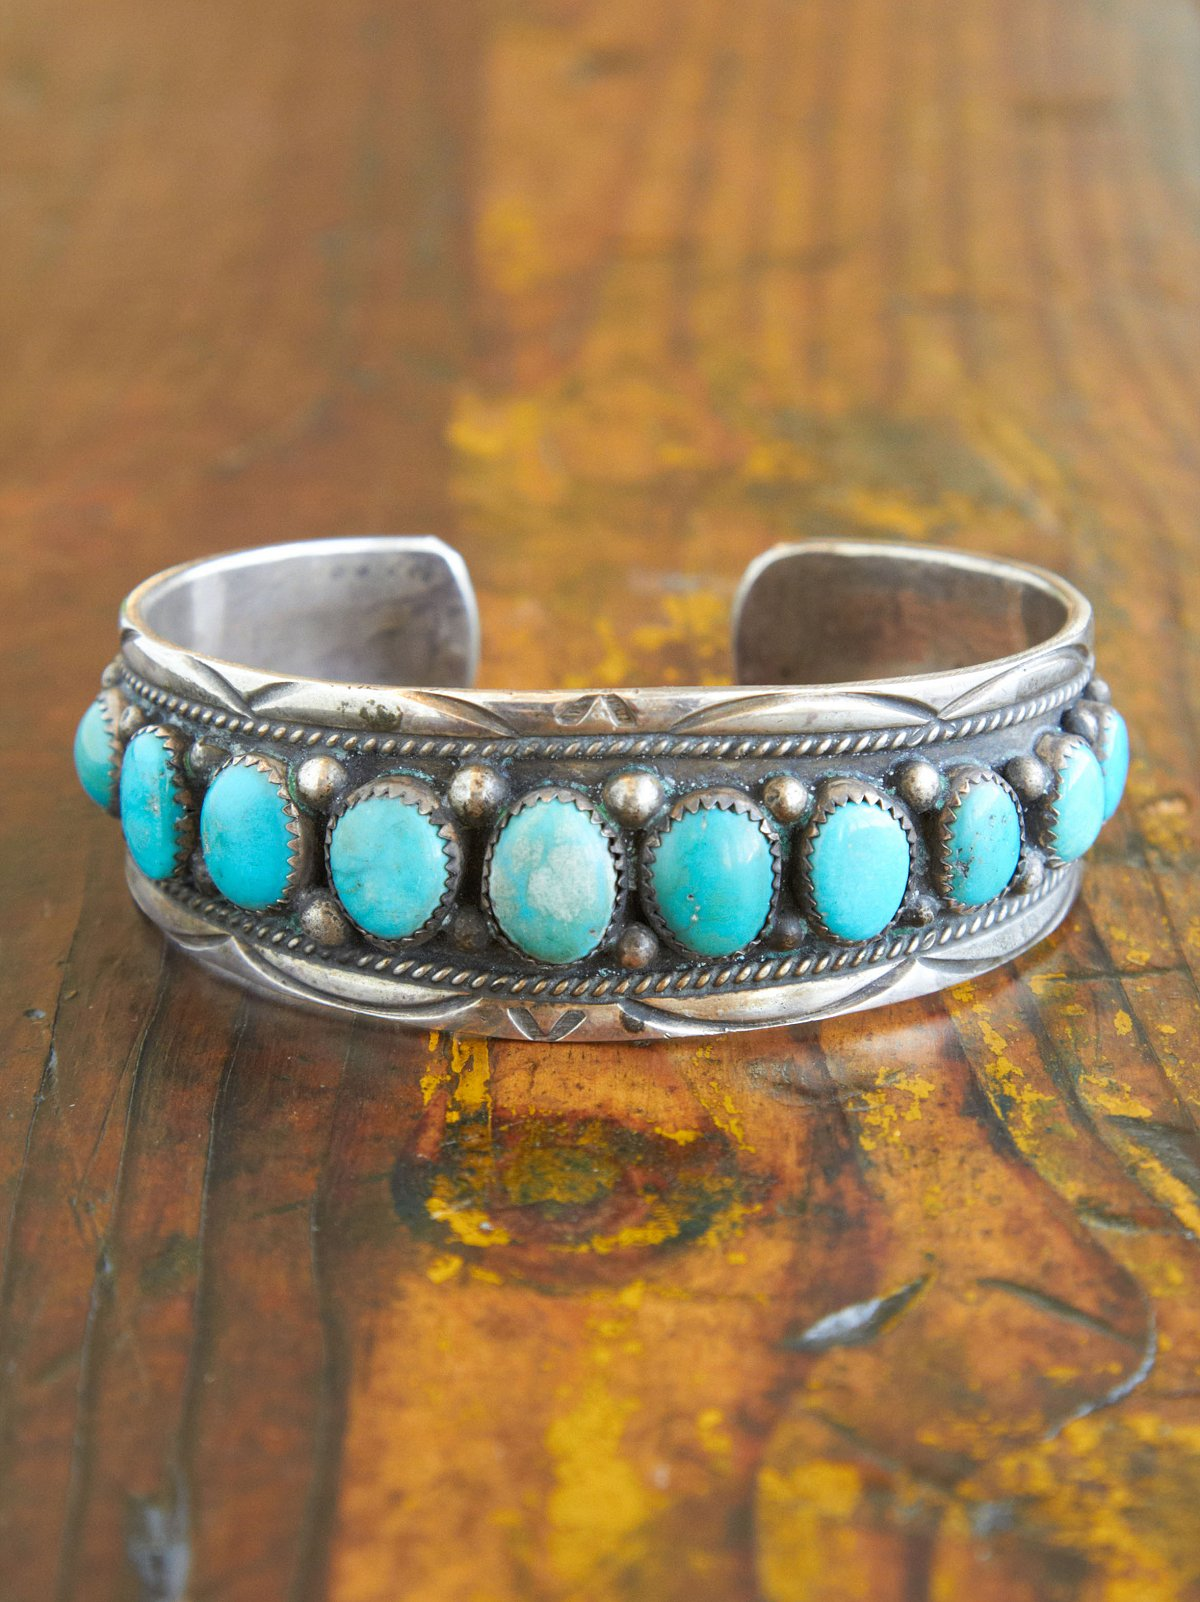 Vintage Turquoise Stone Bracelet